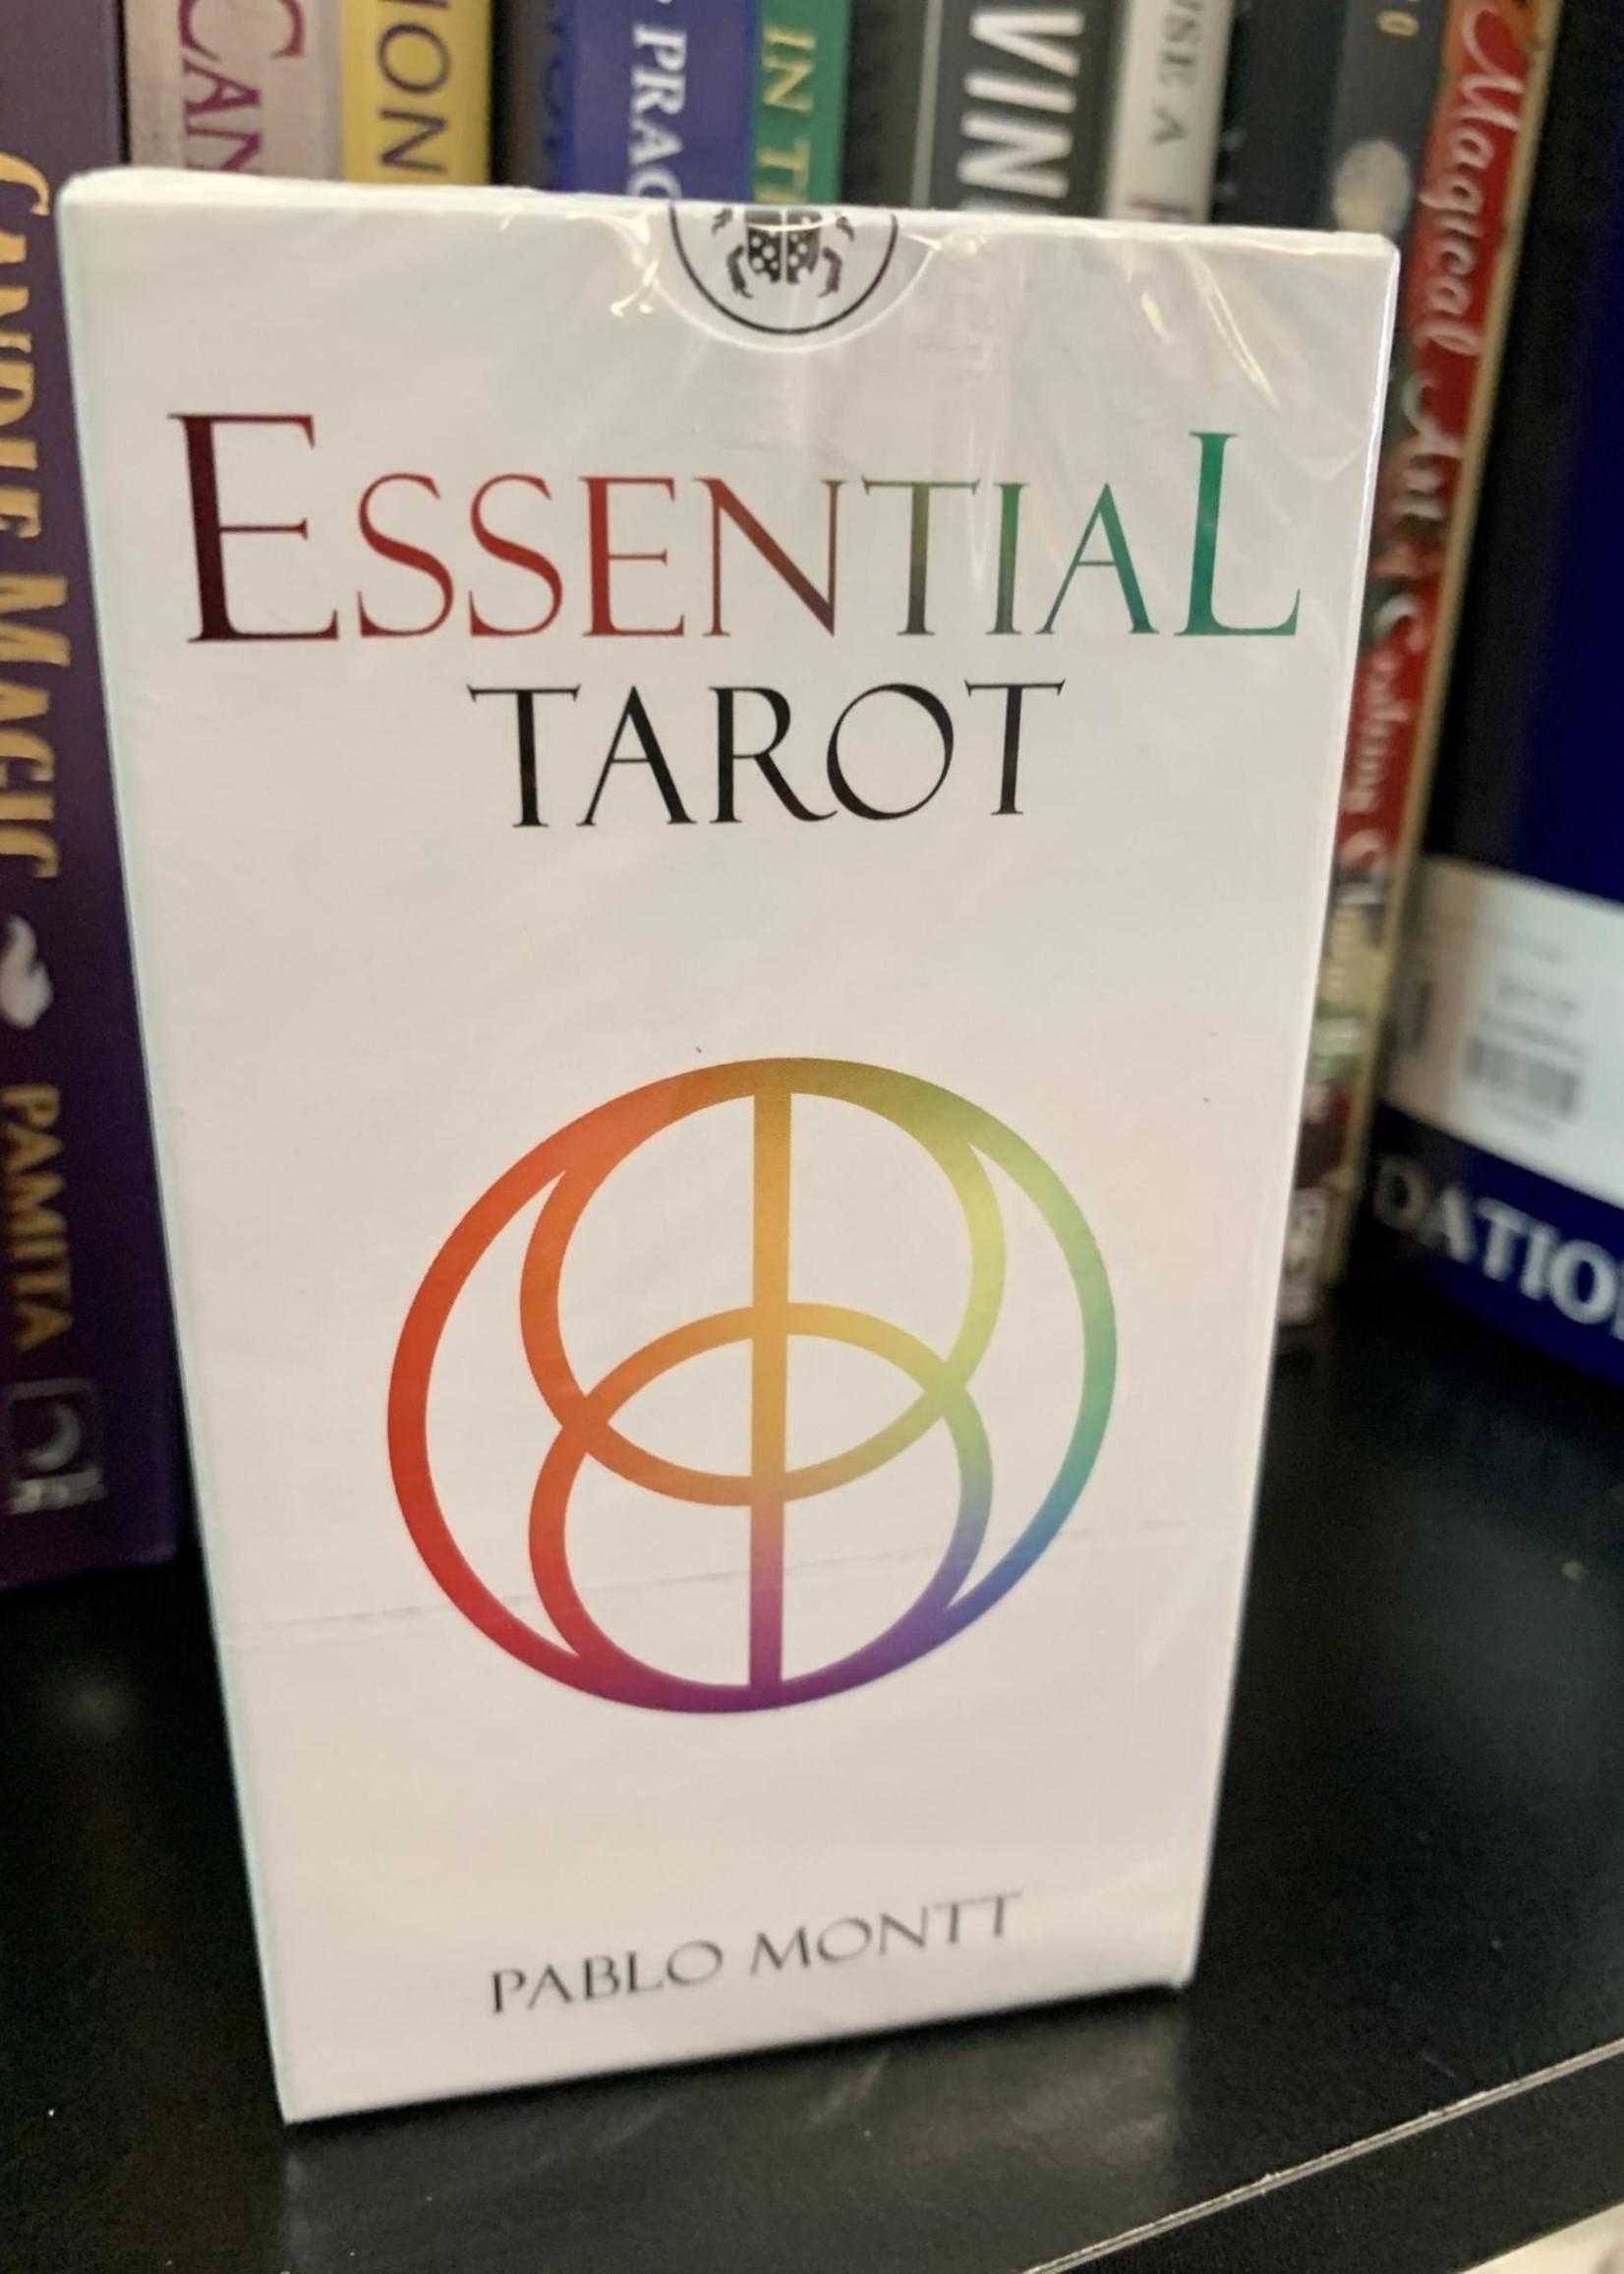 Essential Tarot -  BY PABLO MONTT, VALERIA MENOZZI, LAVINIA PINELLO